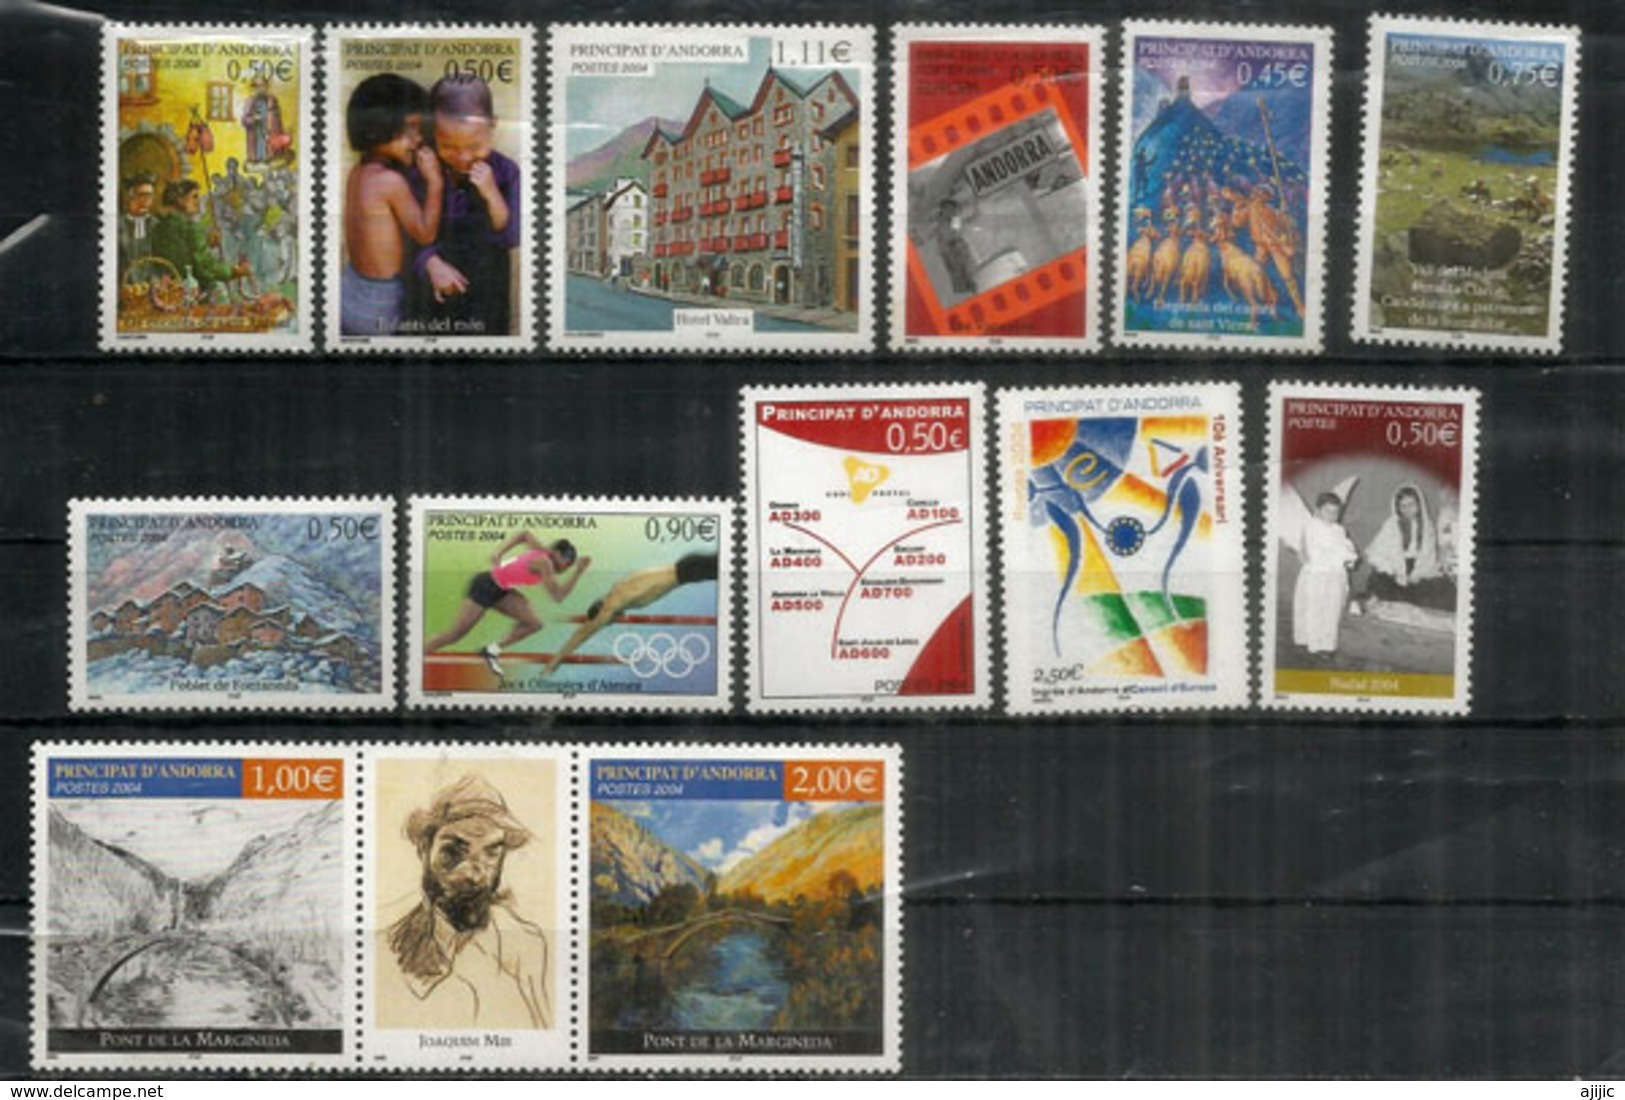 Année Complète 2004, 13 Timbres  Neufs **  Olympics Athens,Conseil De L'Europe,Code Postal Andorran,etc - Andorra Francese